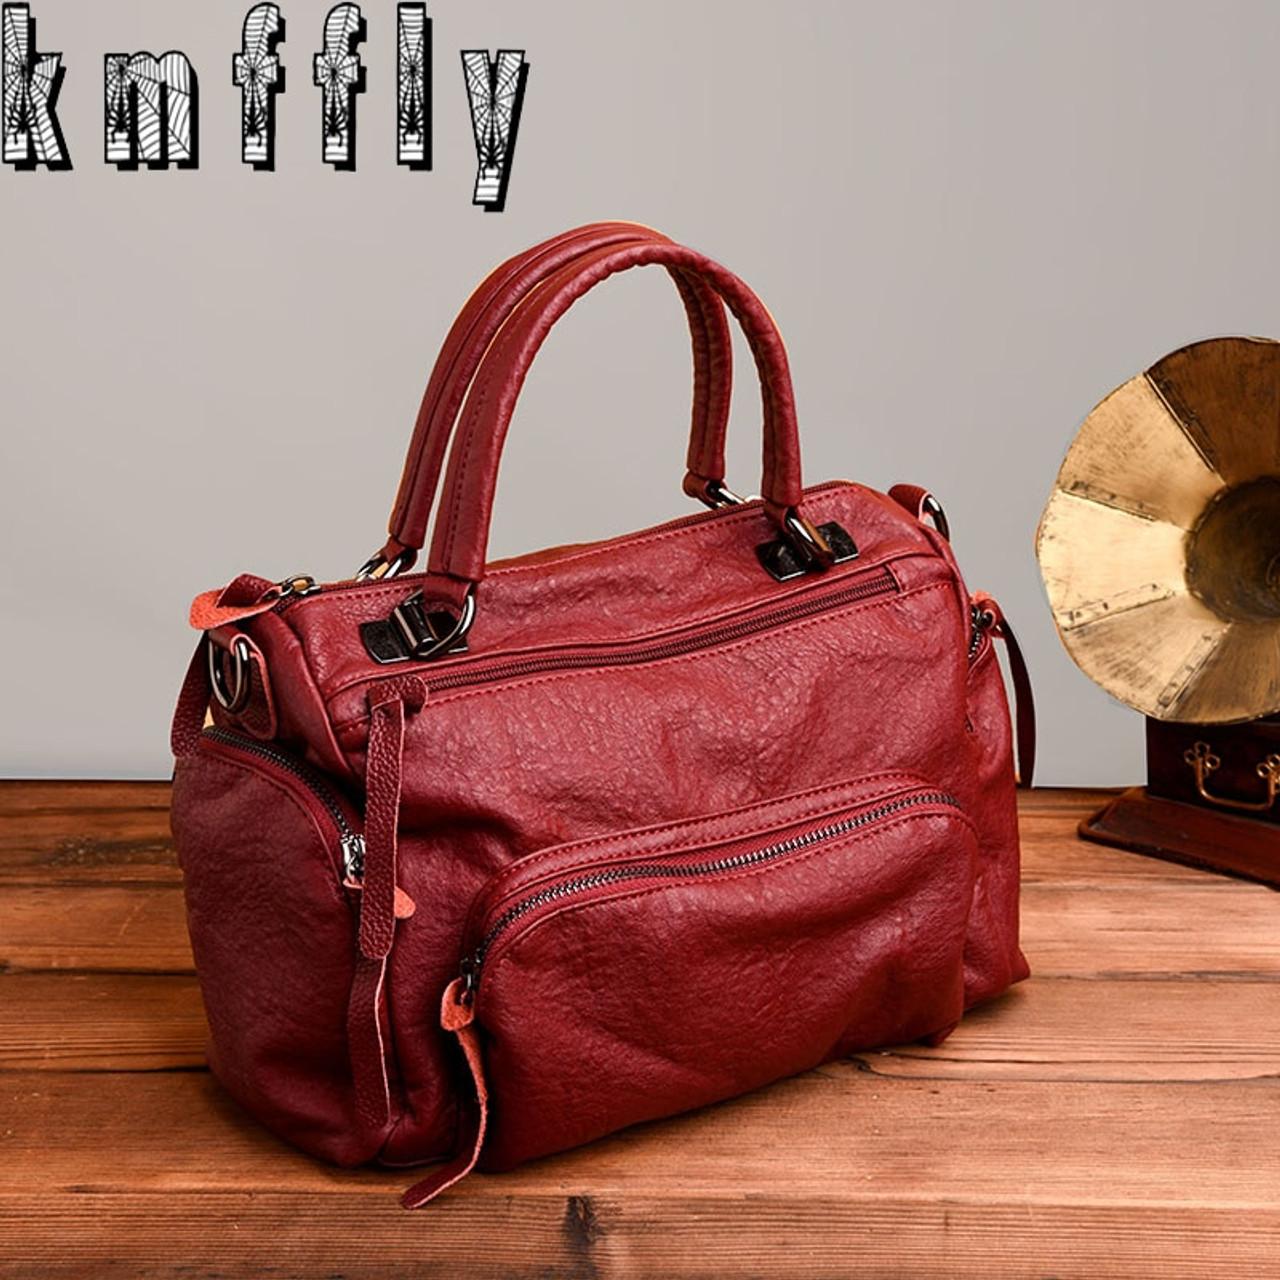 a960bd686da1 KMFFLY 2018 Fashion Women Bag Luxury Brand PU Leather Women Messenger Bags  Ladies Handbags Woman Leather Handbags Sacs - OnshopDeals.Com